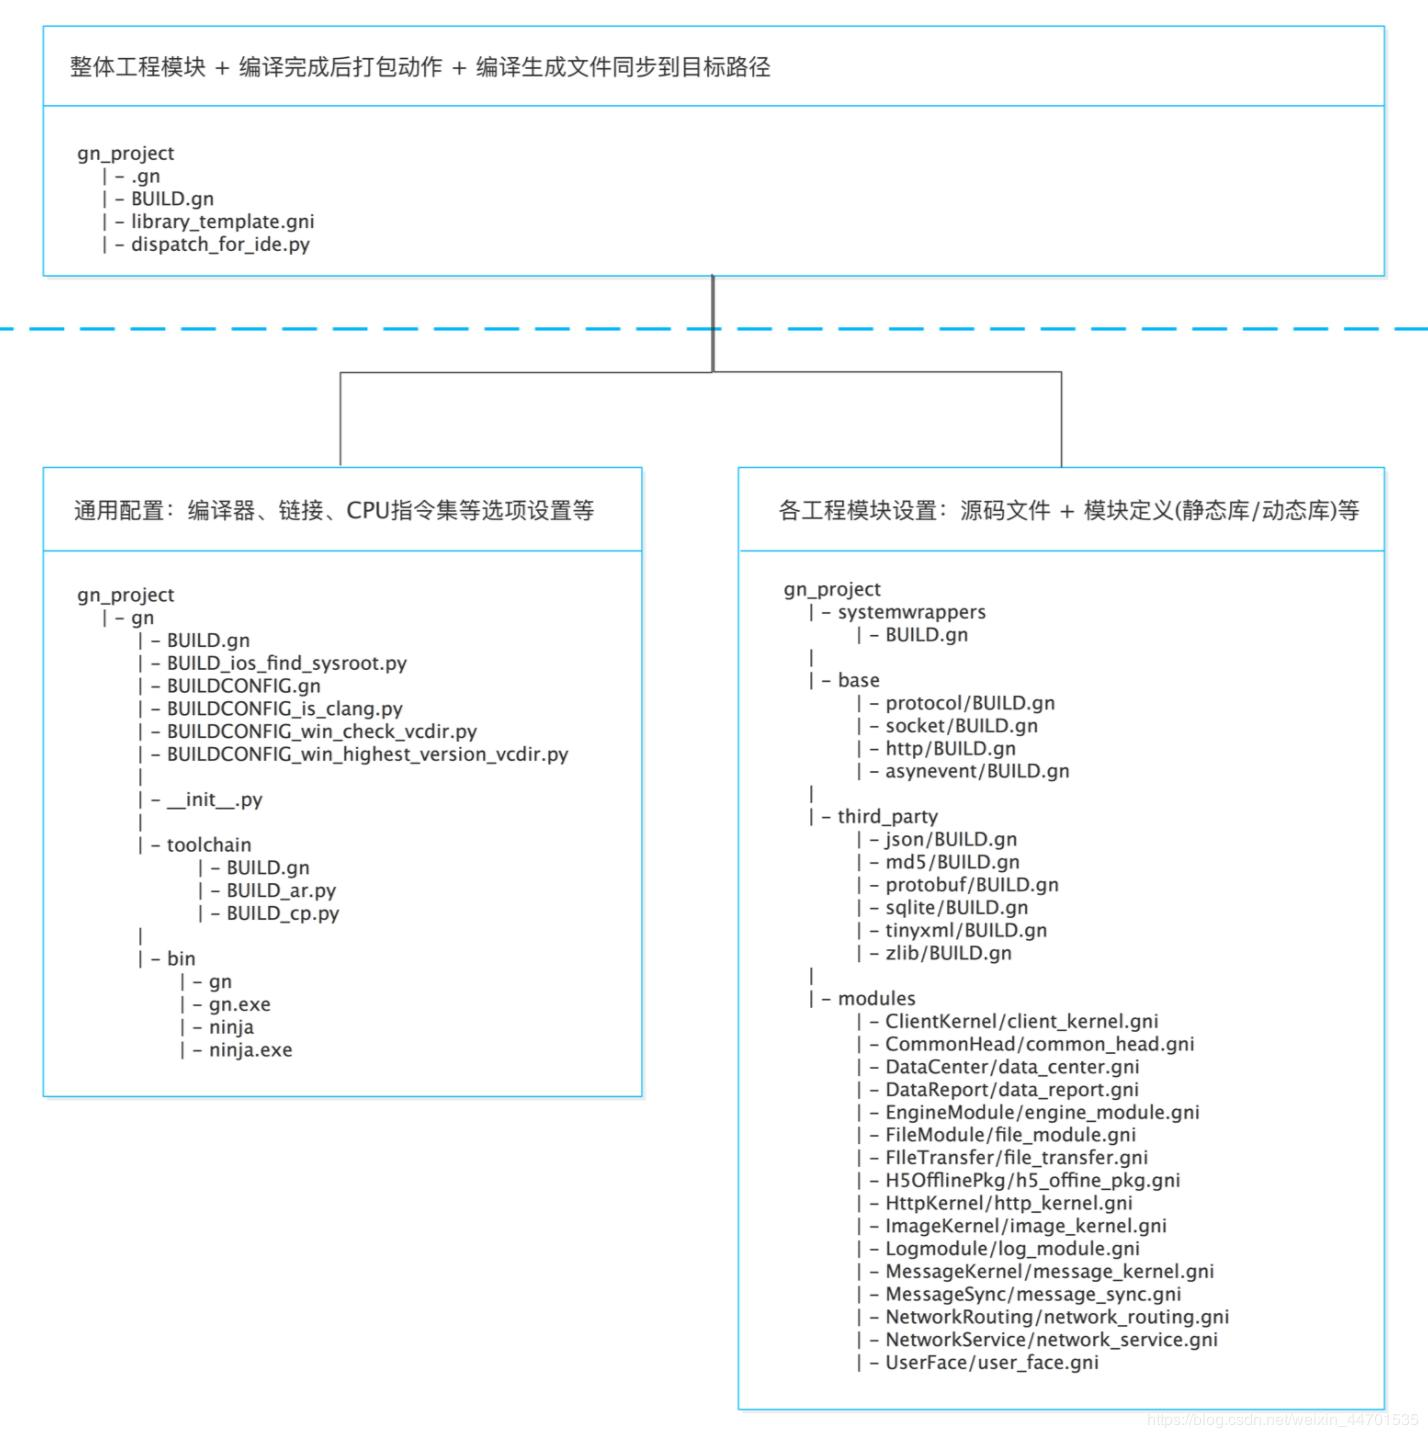 Cross-platform: detailed GN practice (ninja, compile, windows/mac